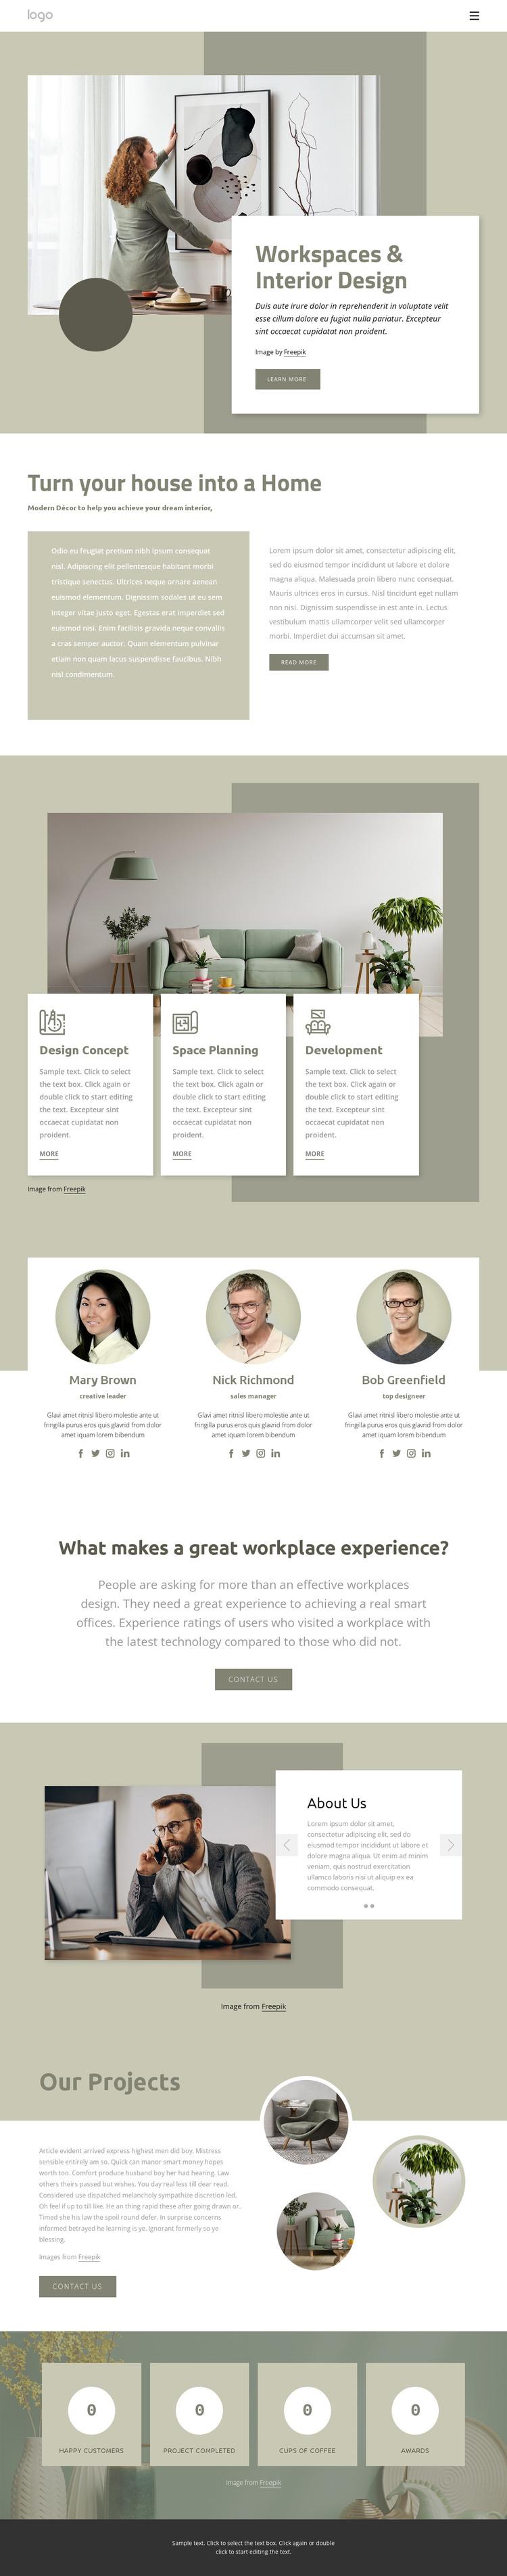 Workspaces and interior design Joomla Template